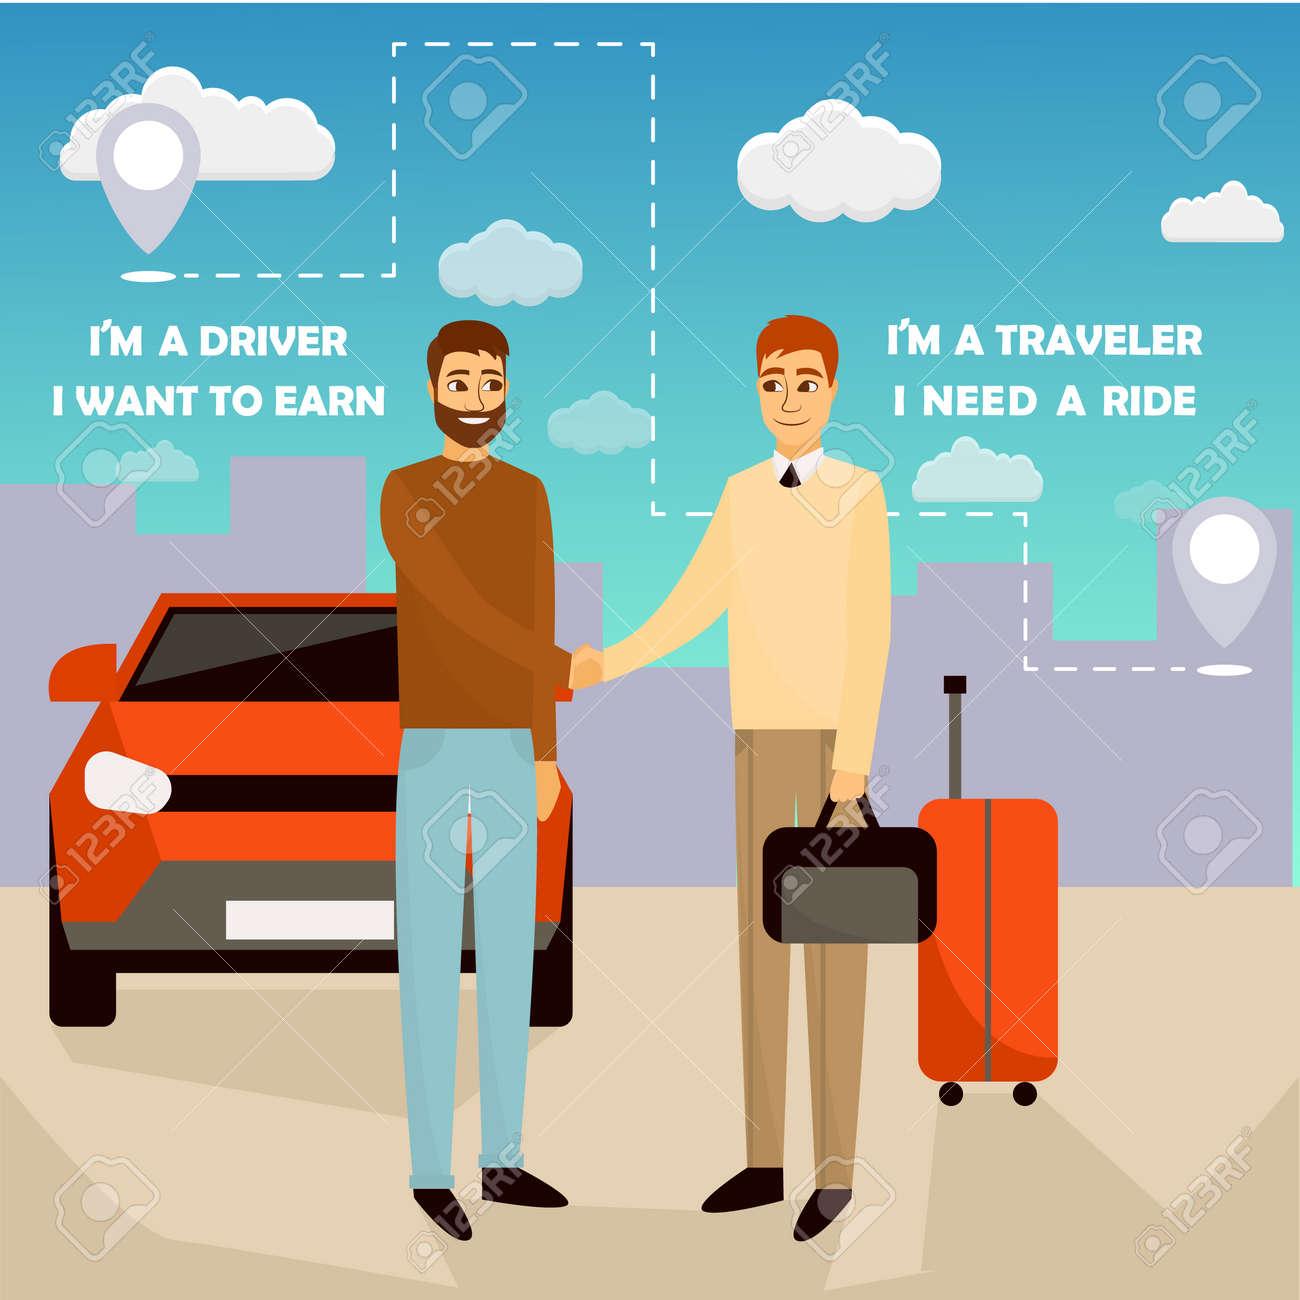 Carpooling Concept Vector Illustration In Cartoon Style Carpool